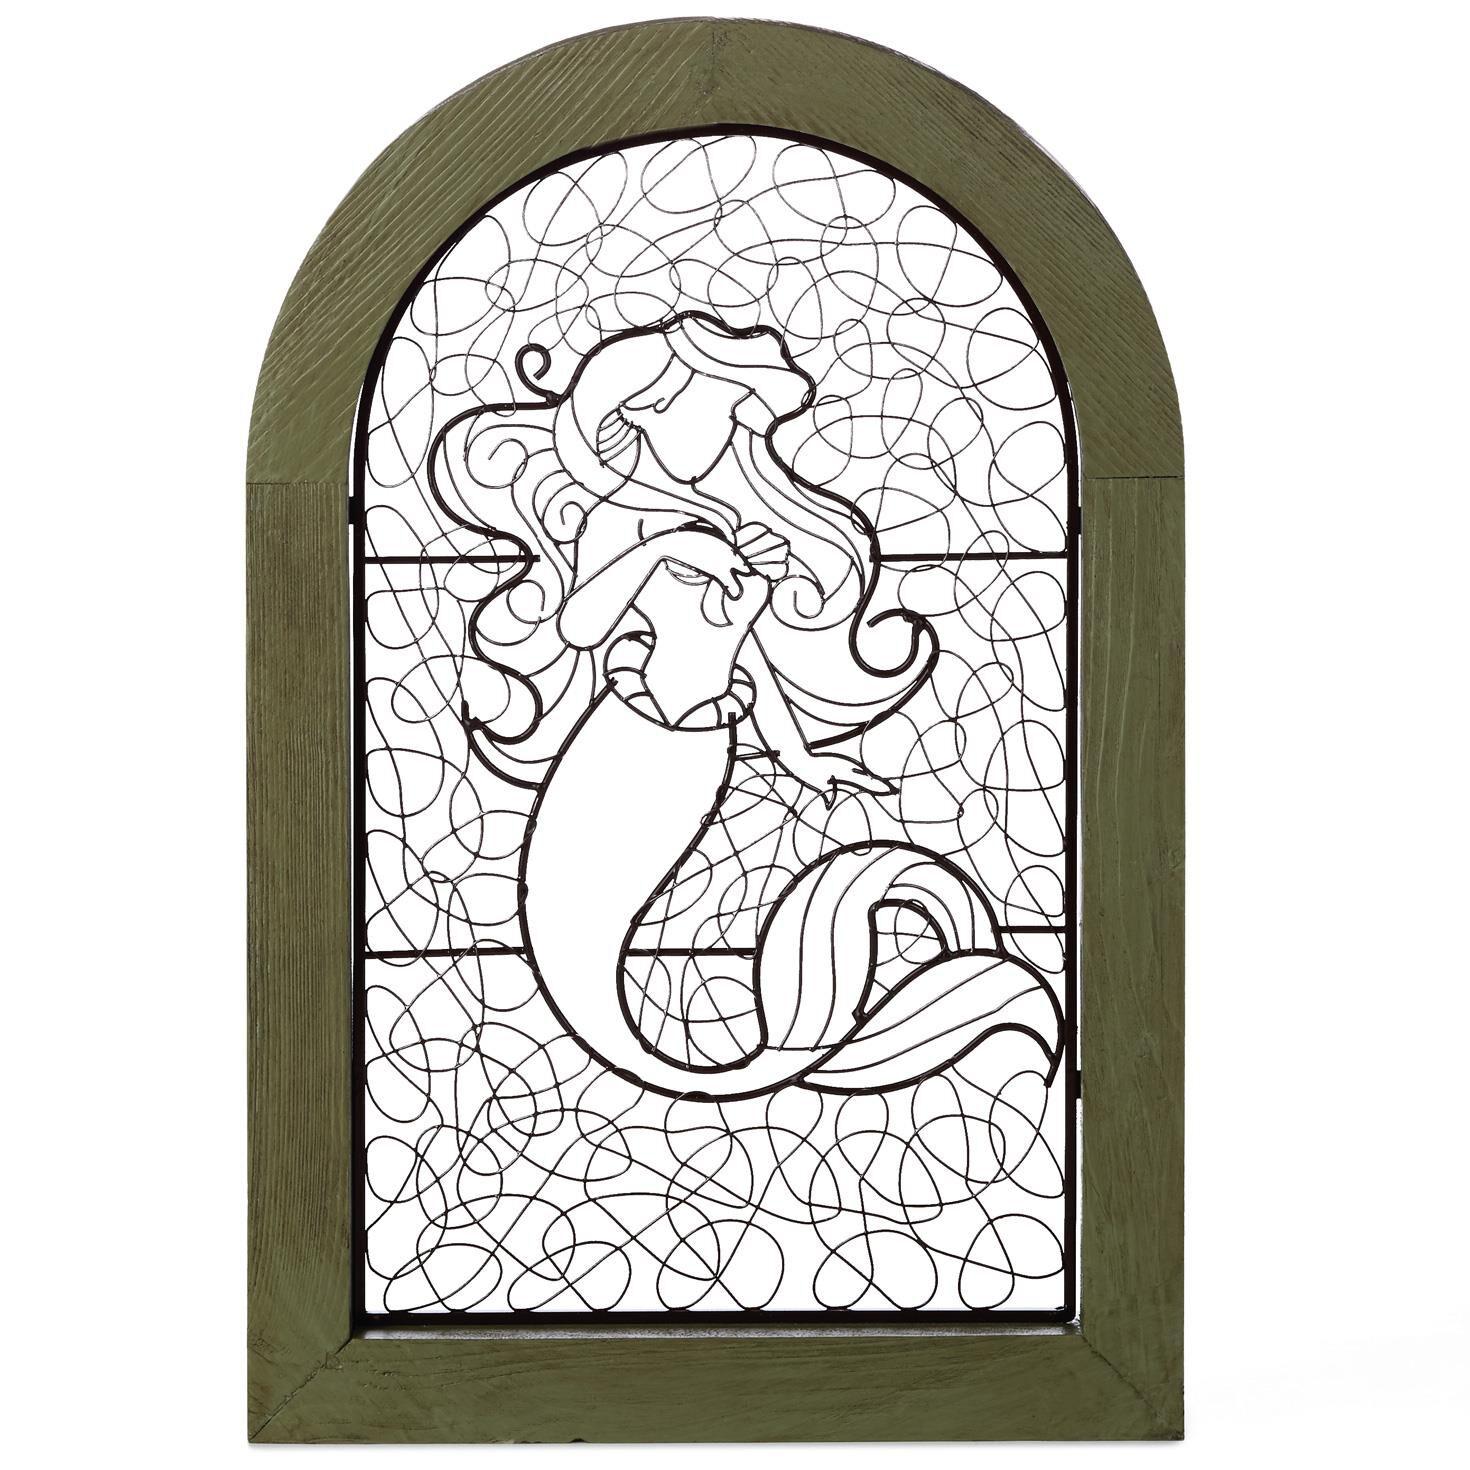 the little mermaid ariel wire art in distressed frame 12x18 framed art prints hallmark